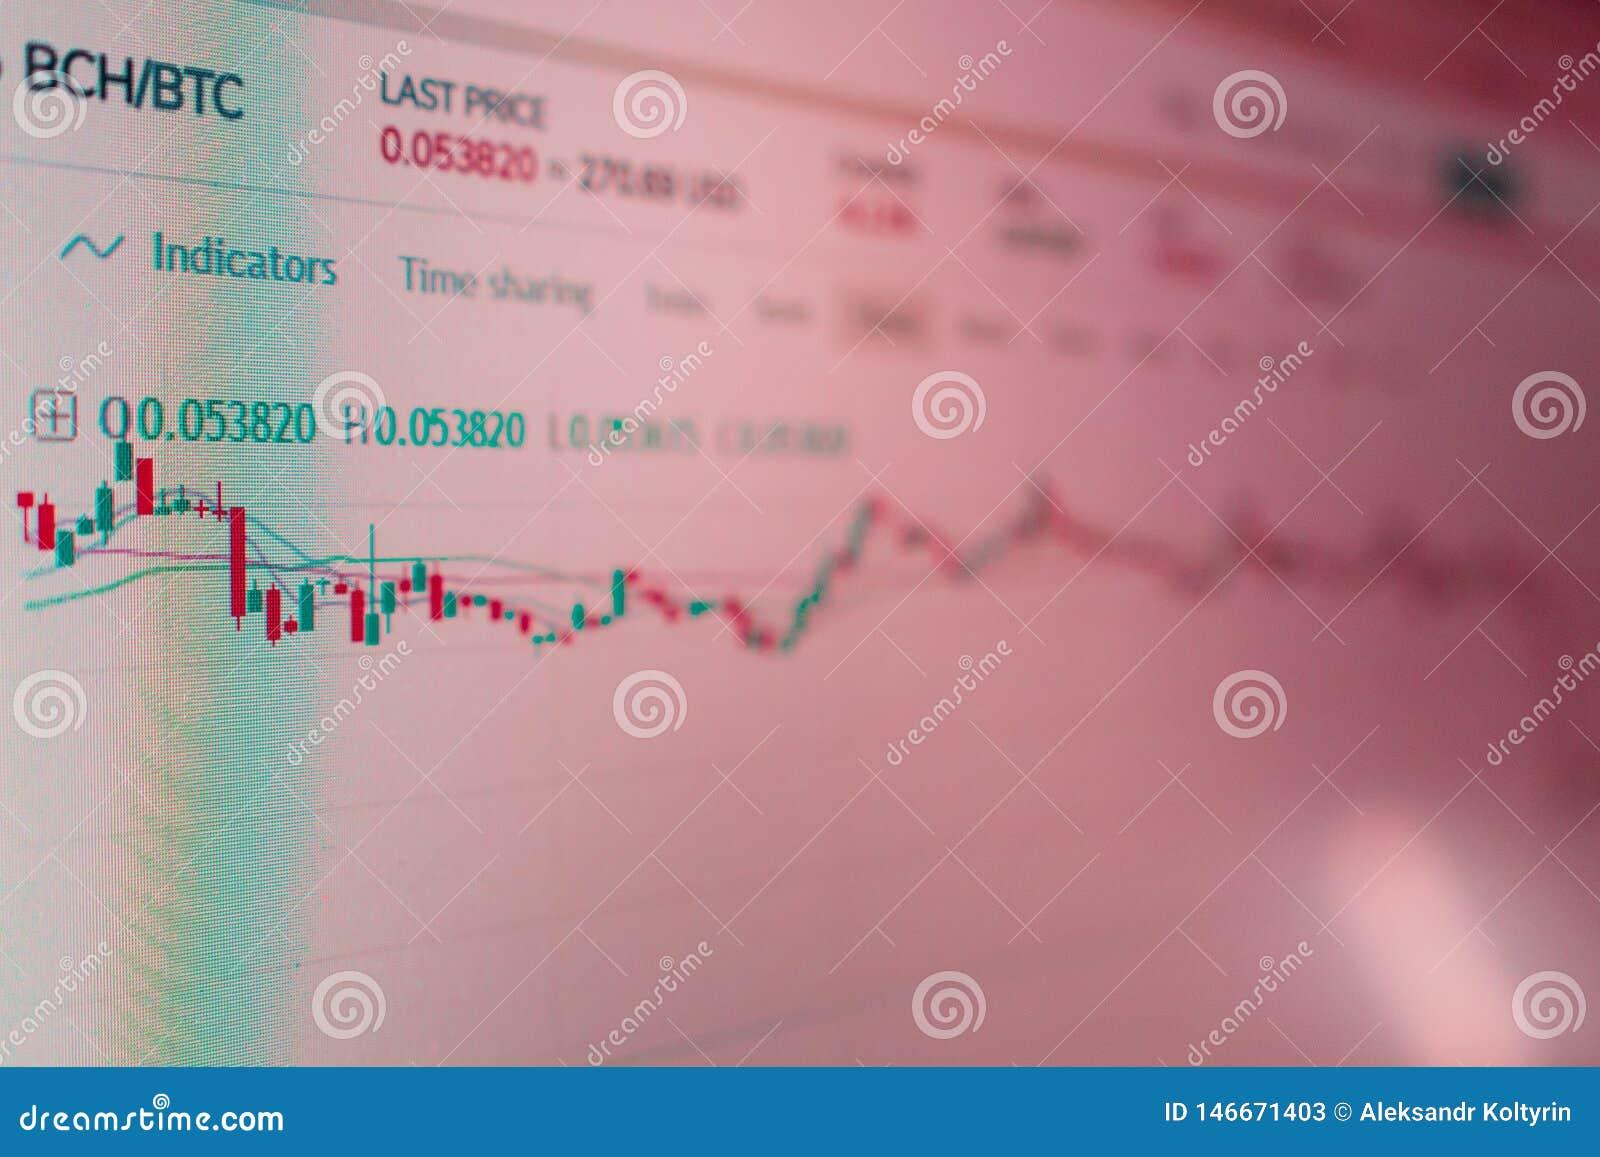 Bitcoin cryptocurrency贸易的应用接口 显示器的照片 cryptocurrencies的挥发性